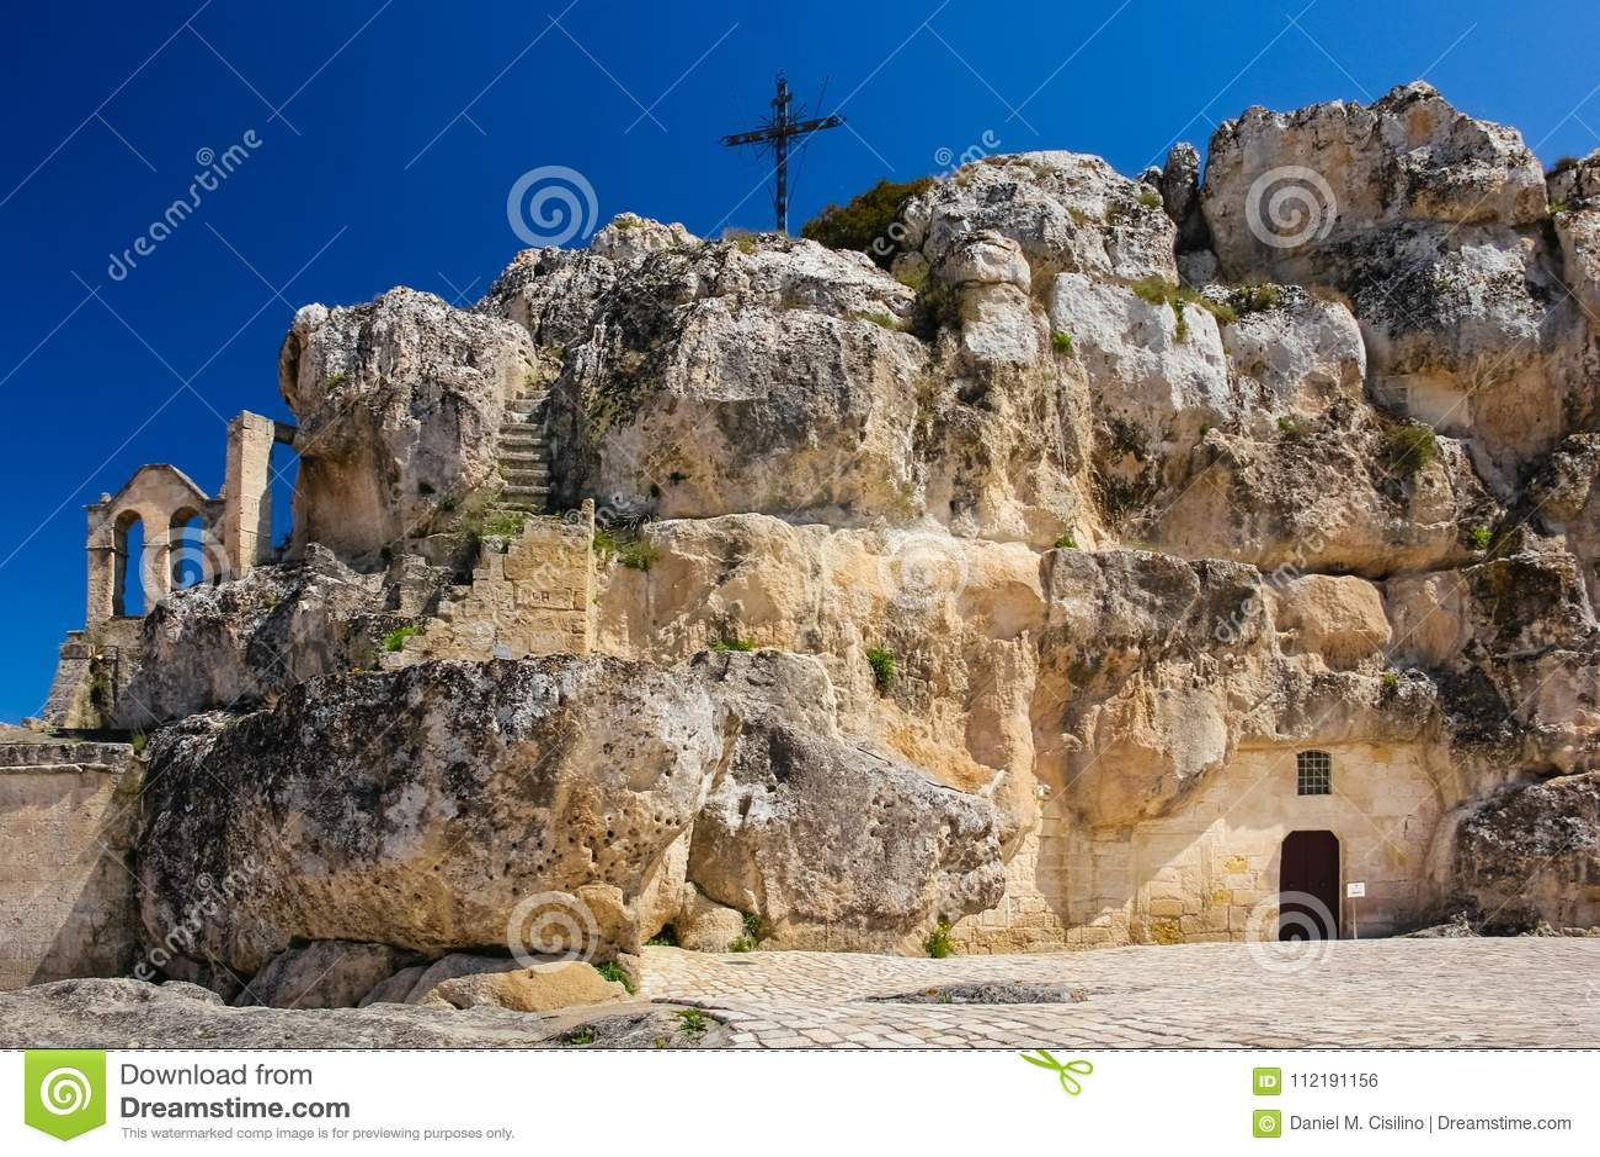 Piazza Madonna de Idris. Matera. Basilicata. Apulia or Puglia. Italy